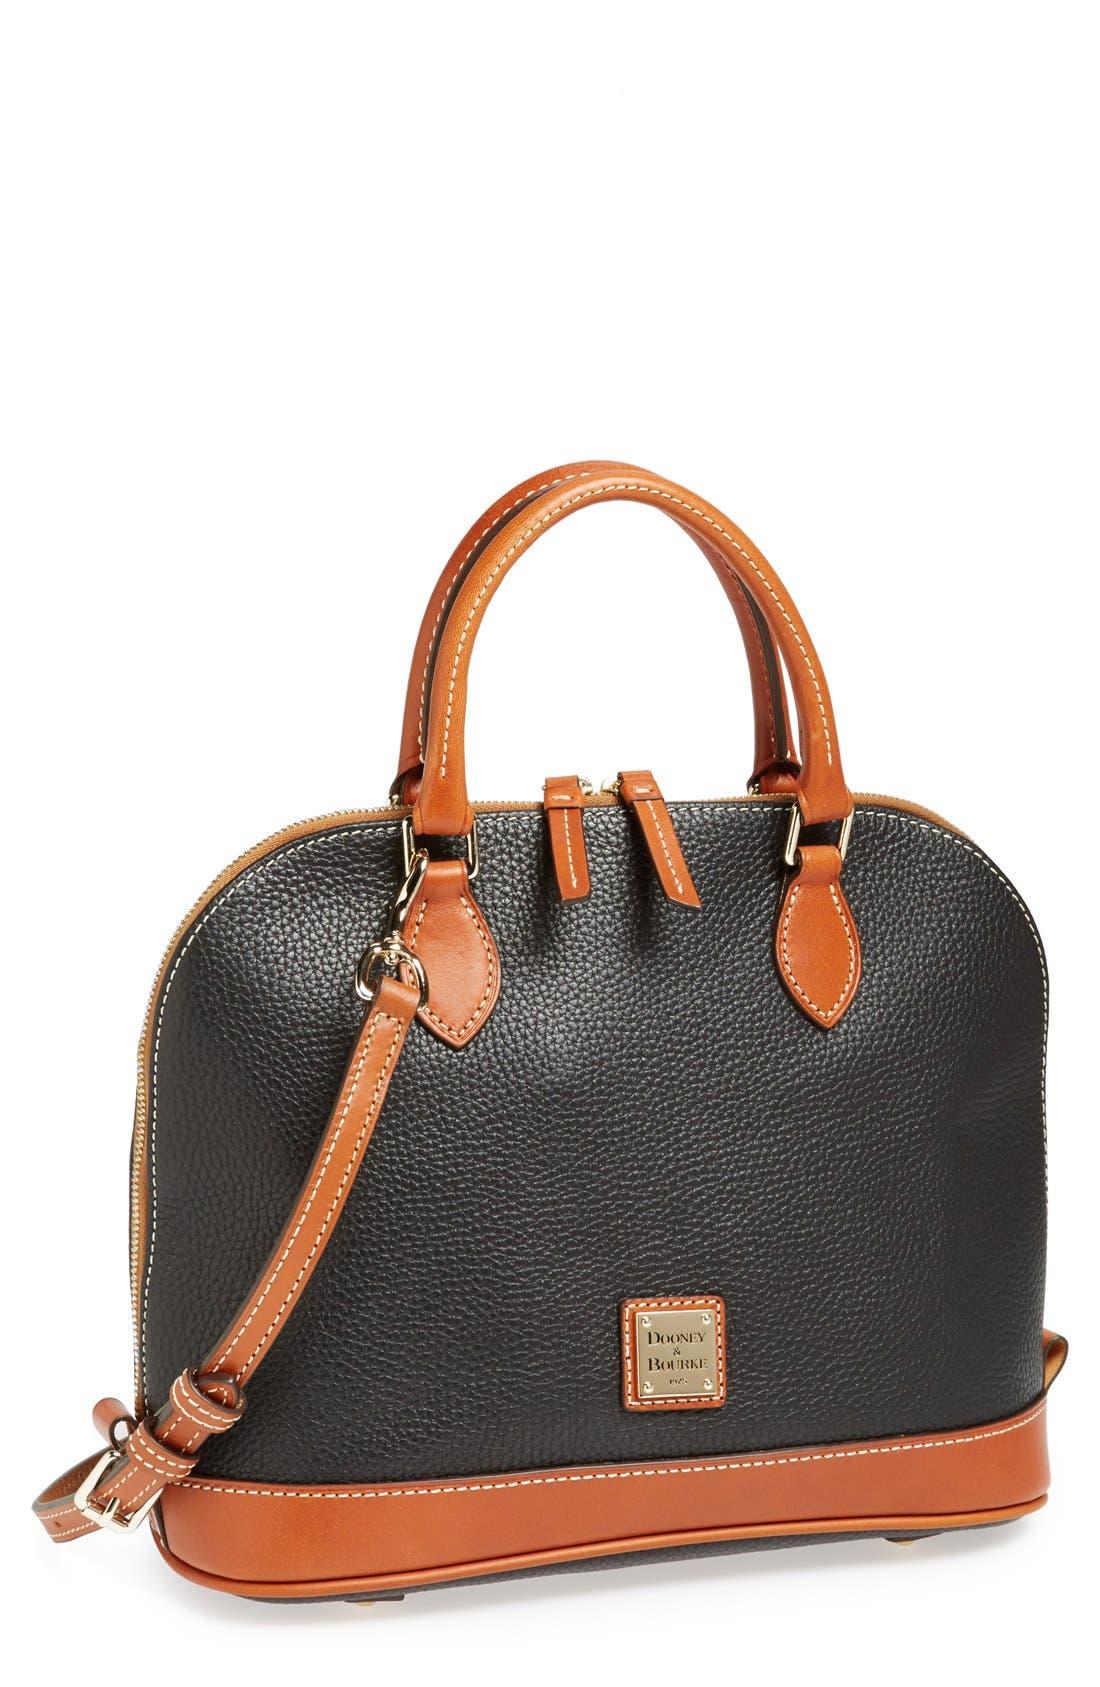 'Pebble Grain Collection' Water Repellent Leather Zip Satchel,                             Main thumbnail 1, color,                             015